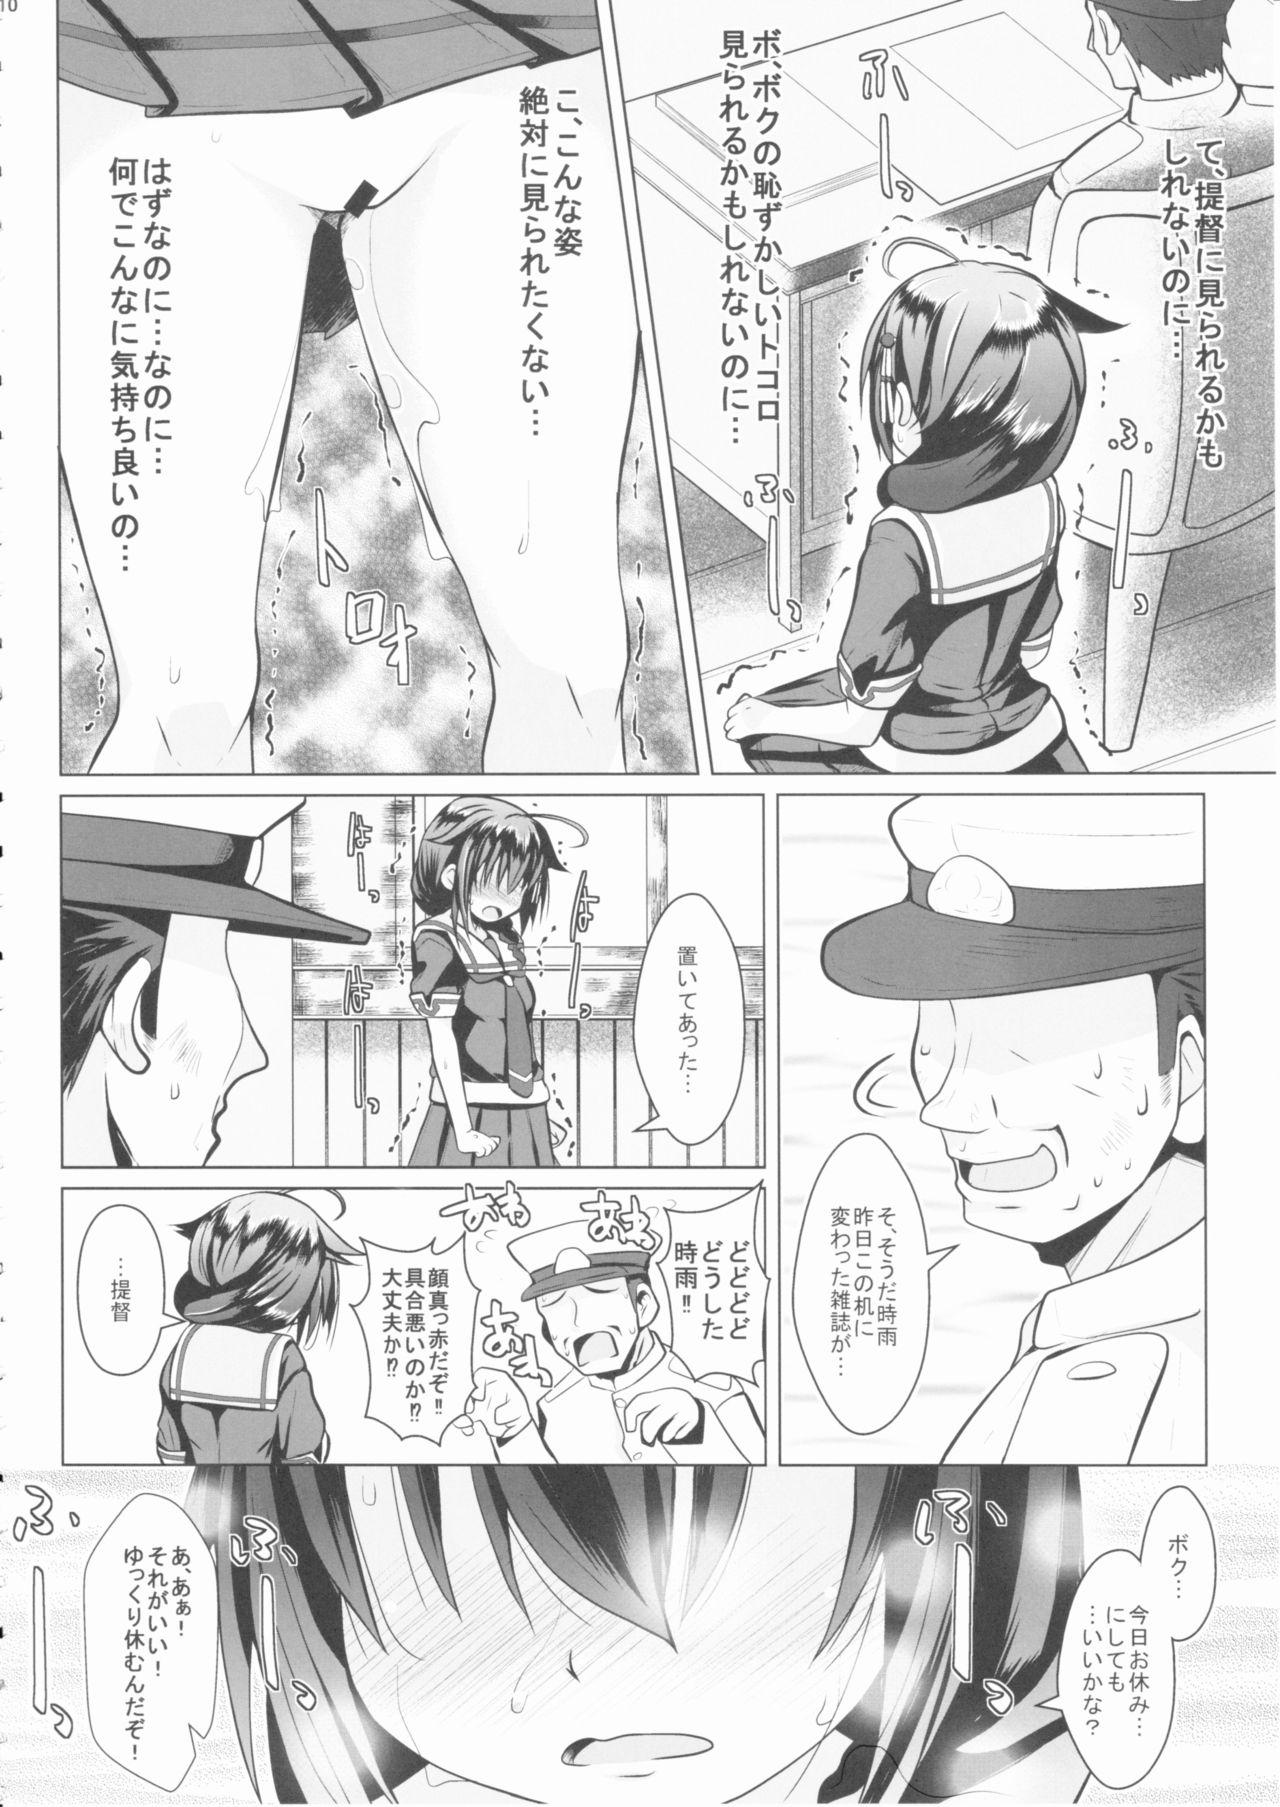 Yagai no Amaoto 8